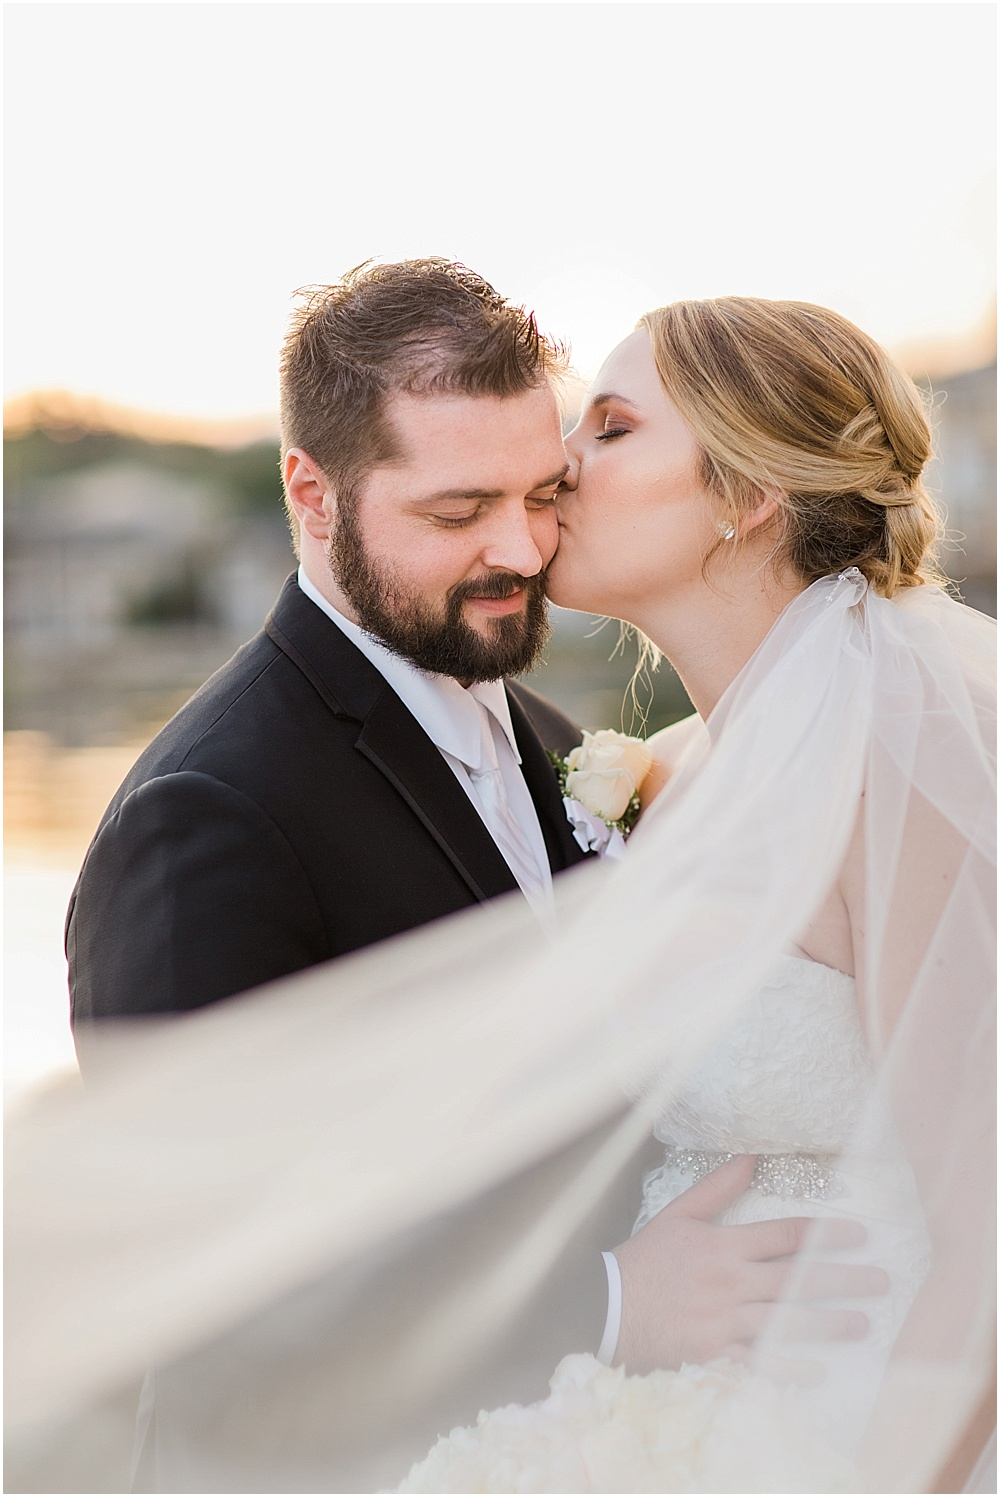 mitzner_silverdale_beach_hotel_wedding_silverdale_washington_pacific_northwest_wedding_photographer_0084